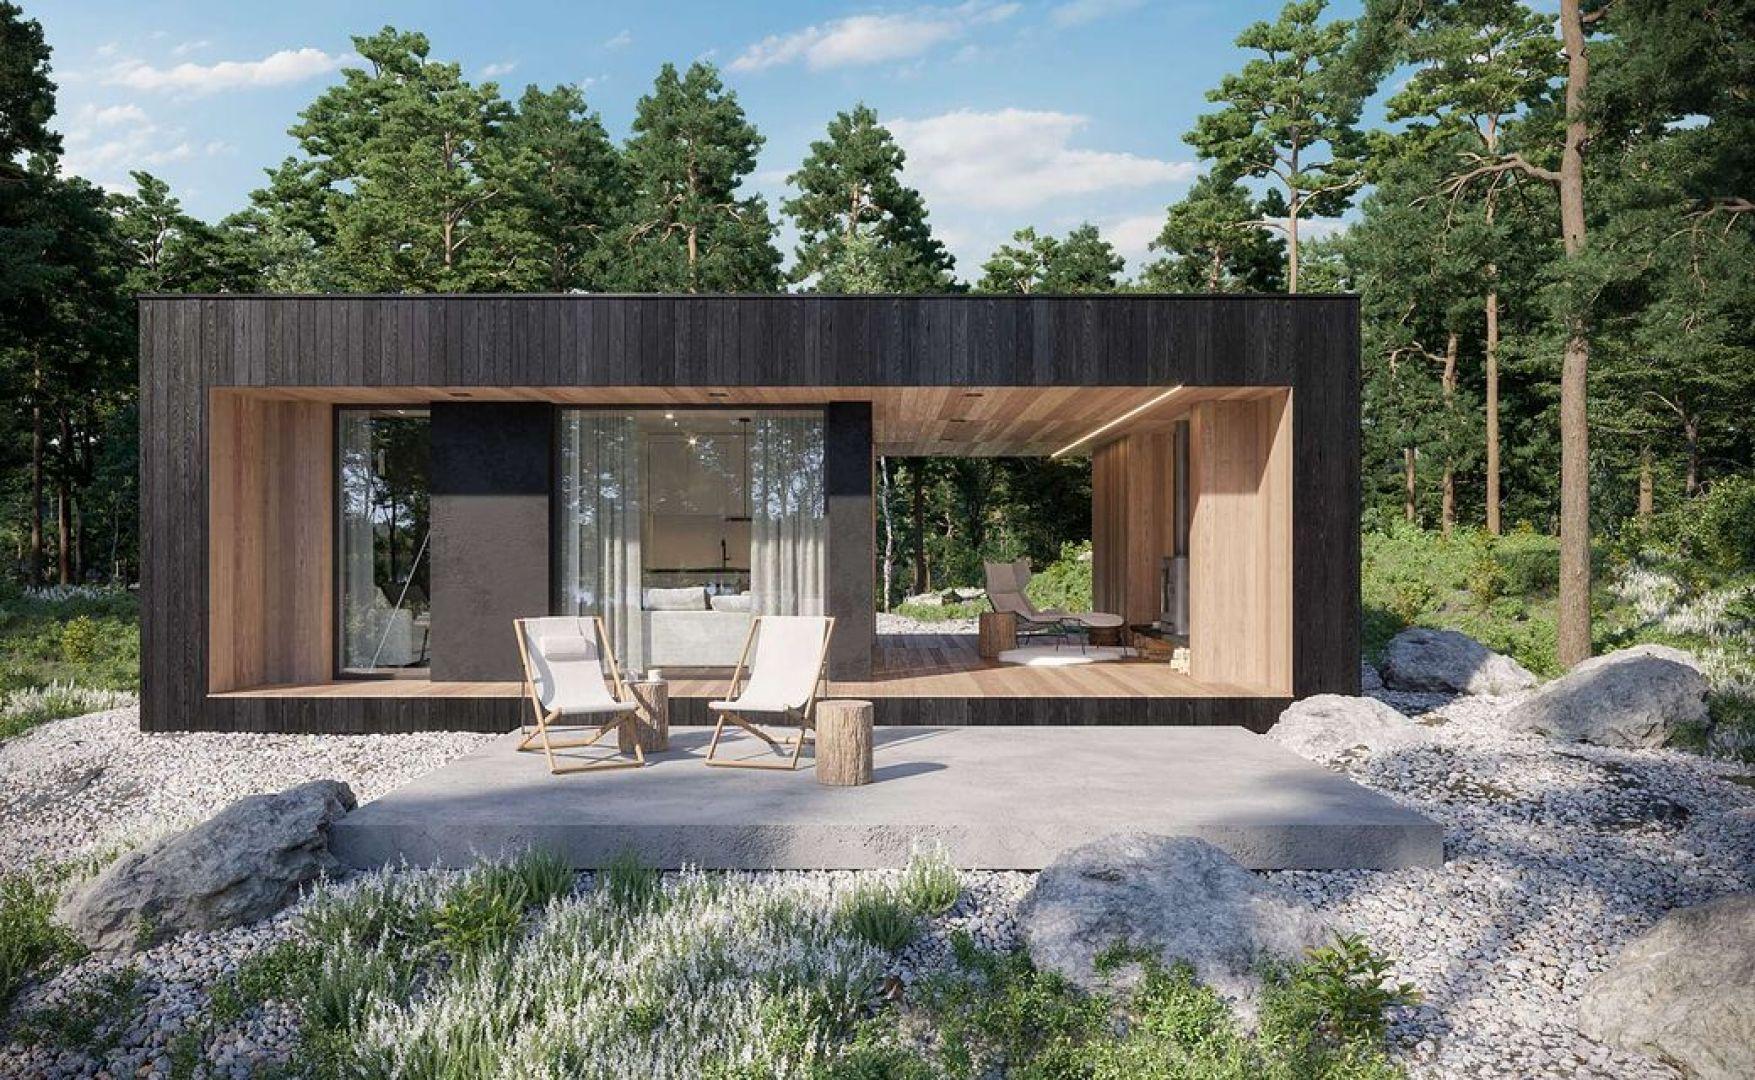 Projekt domu HomeKONCEPT-84 DL. Powierzchnia: 35 m2. Autorzy projektu: HomeKONCEPT